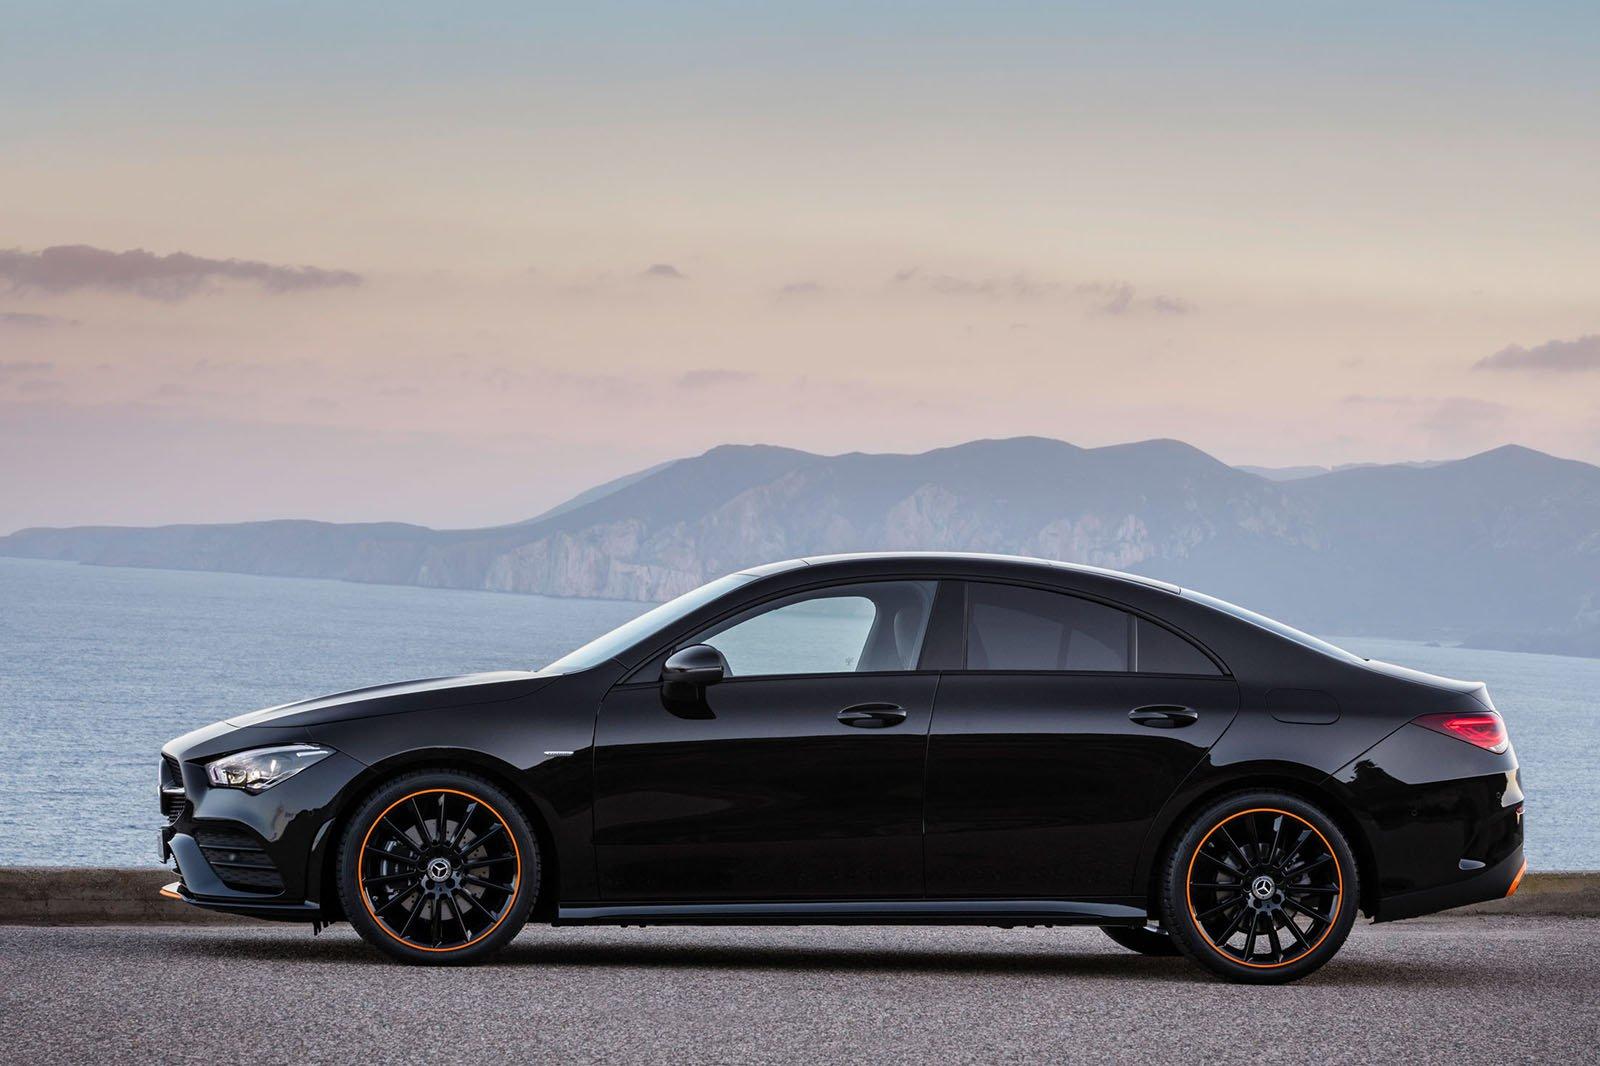 Mercedes-Benz CLA side